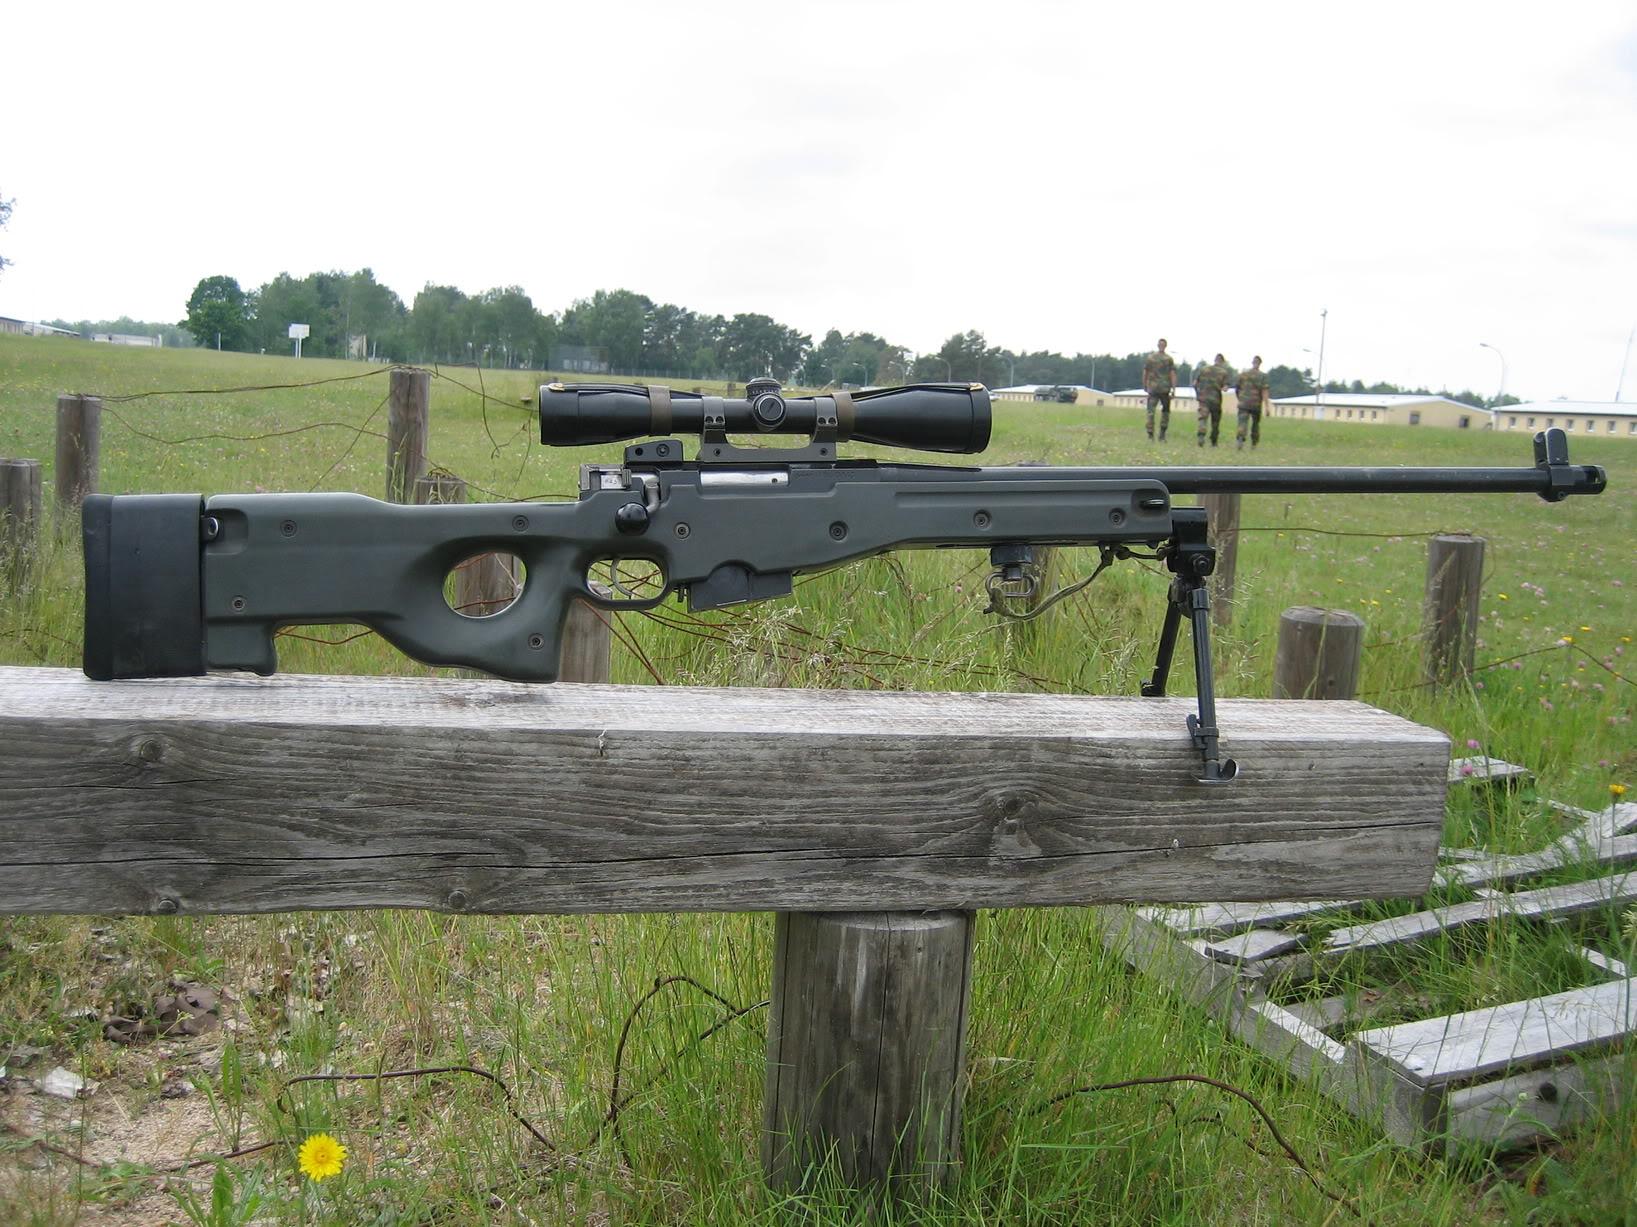 AW 7.62mm rifle,  Belgian Army sniperrifle GTA2008_0483